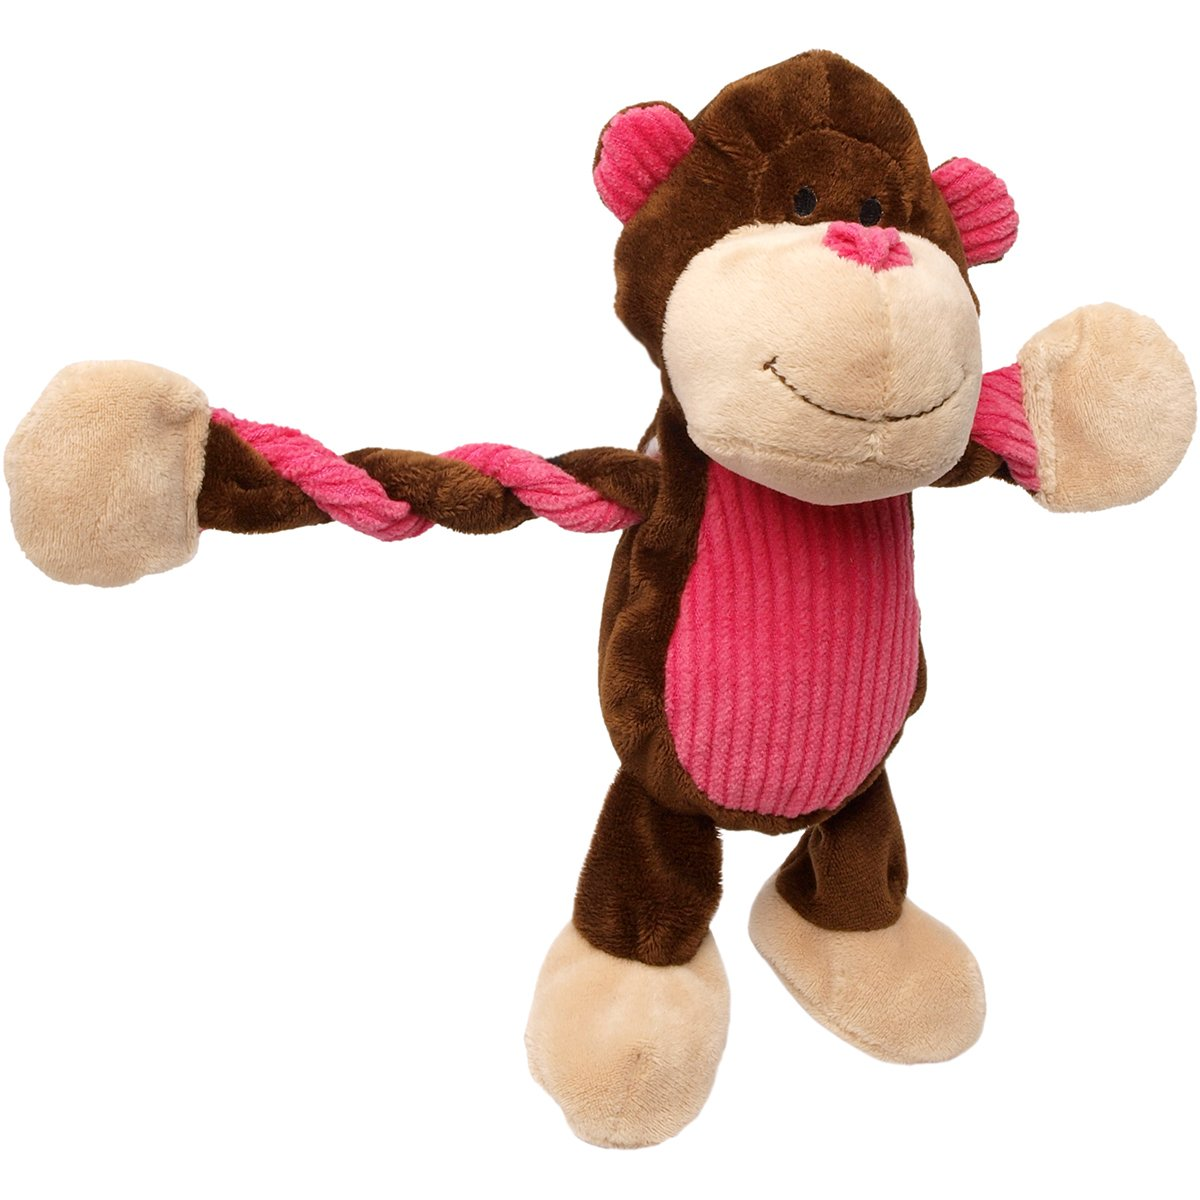 Charming Pet Products Pulleez Zebra Plush Dog Toy